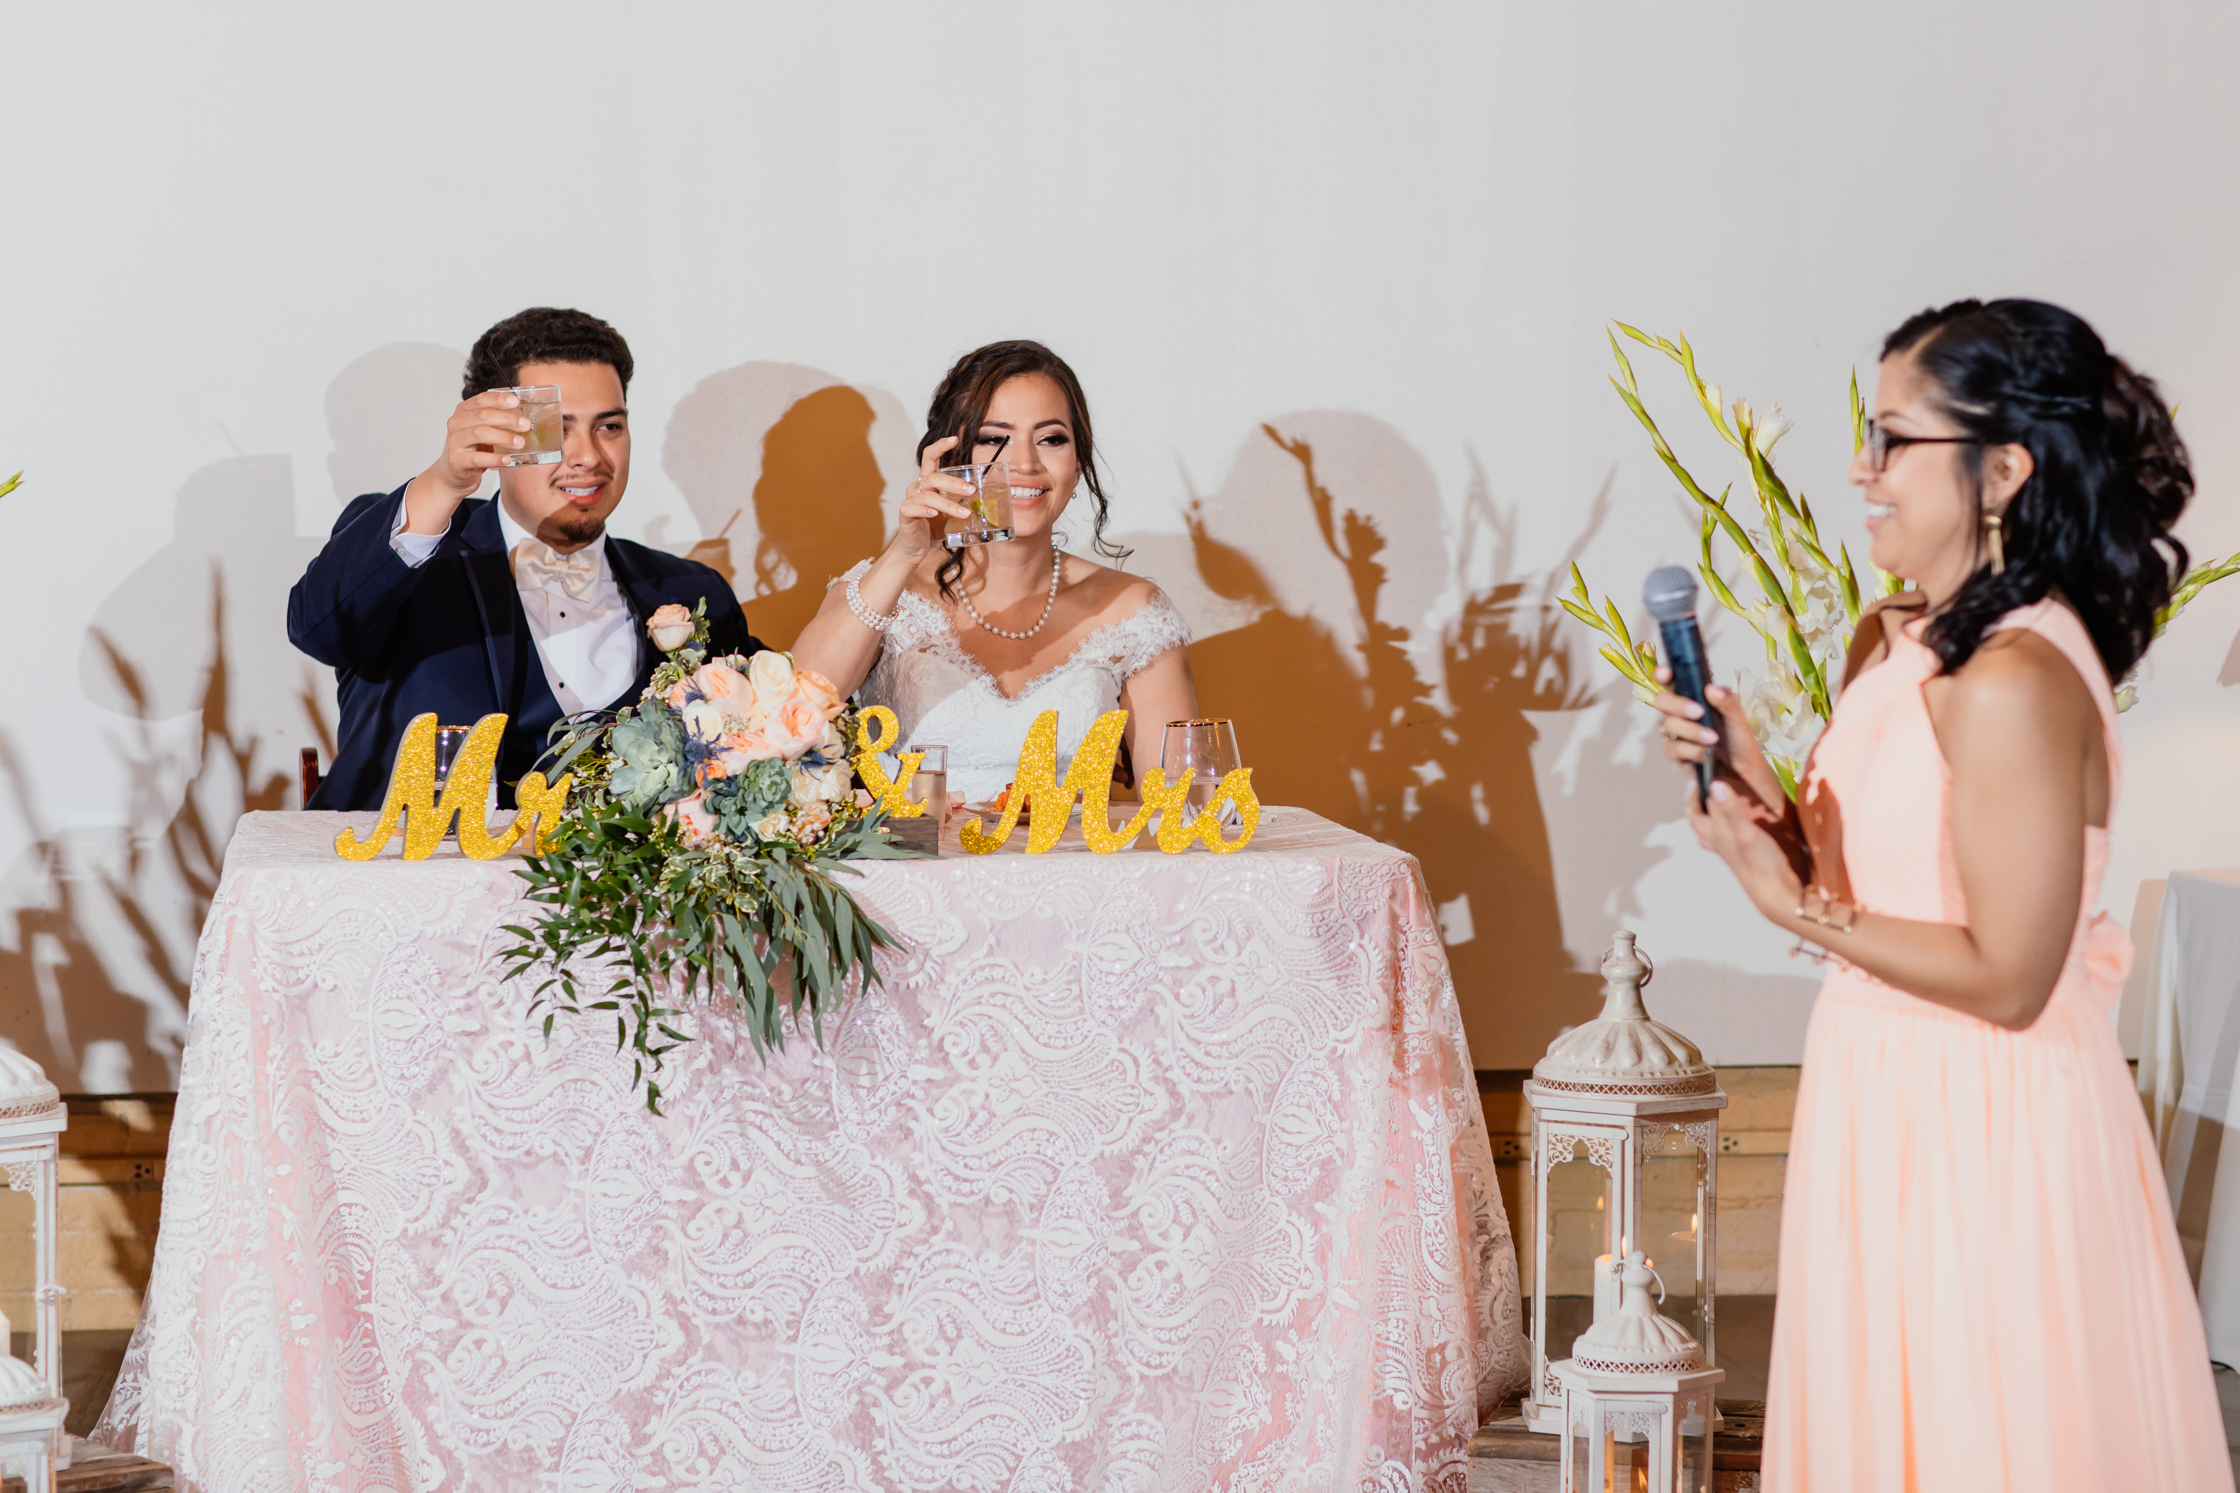 luis_joanna_wedding-87.jpg